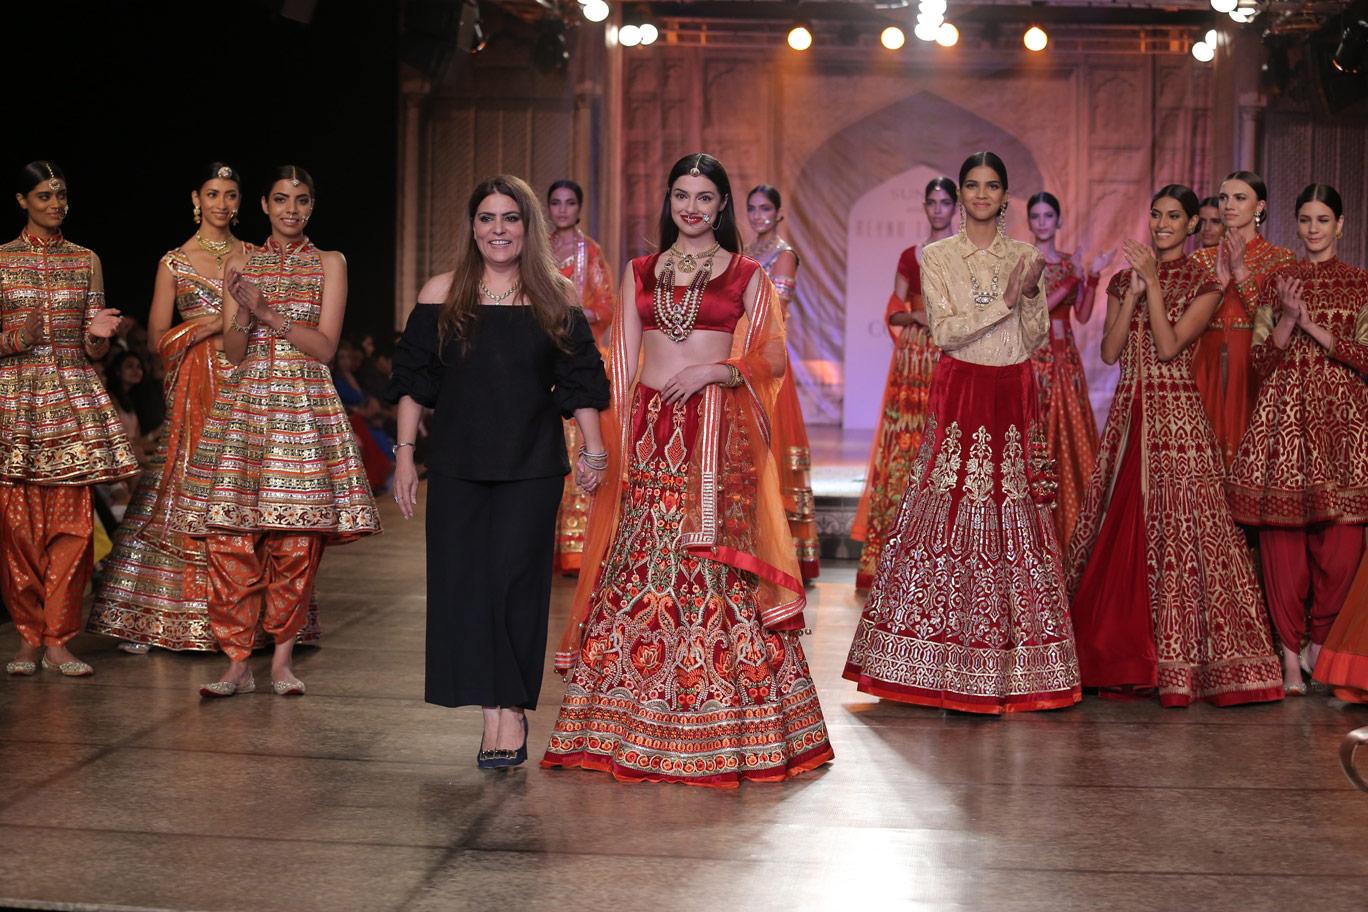 Designer-Reynu-Taandon-and-Divya-Kumar-Khosla-KAMANGIRI-By-Reynu-Taandon-In-Association-with-SUNAR-@-India-Couture-Week-16-(4)